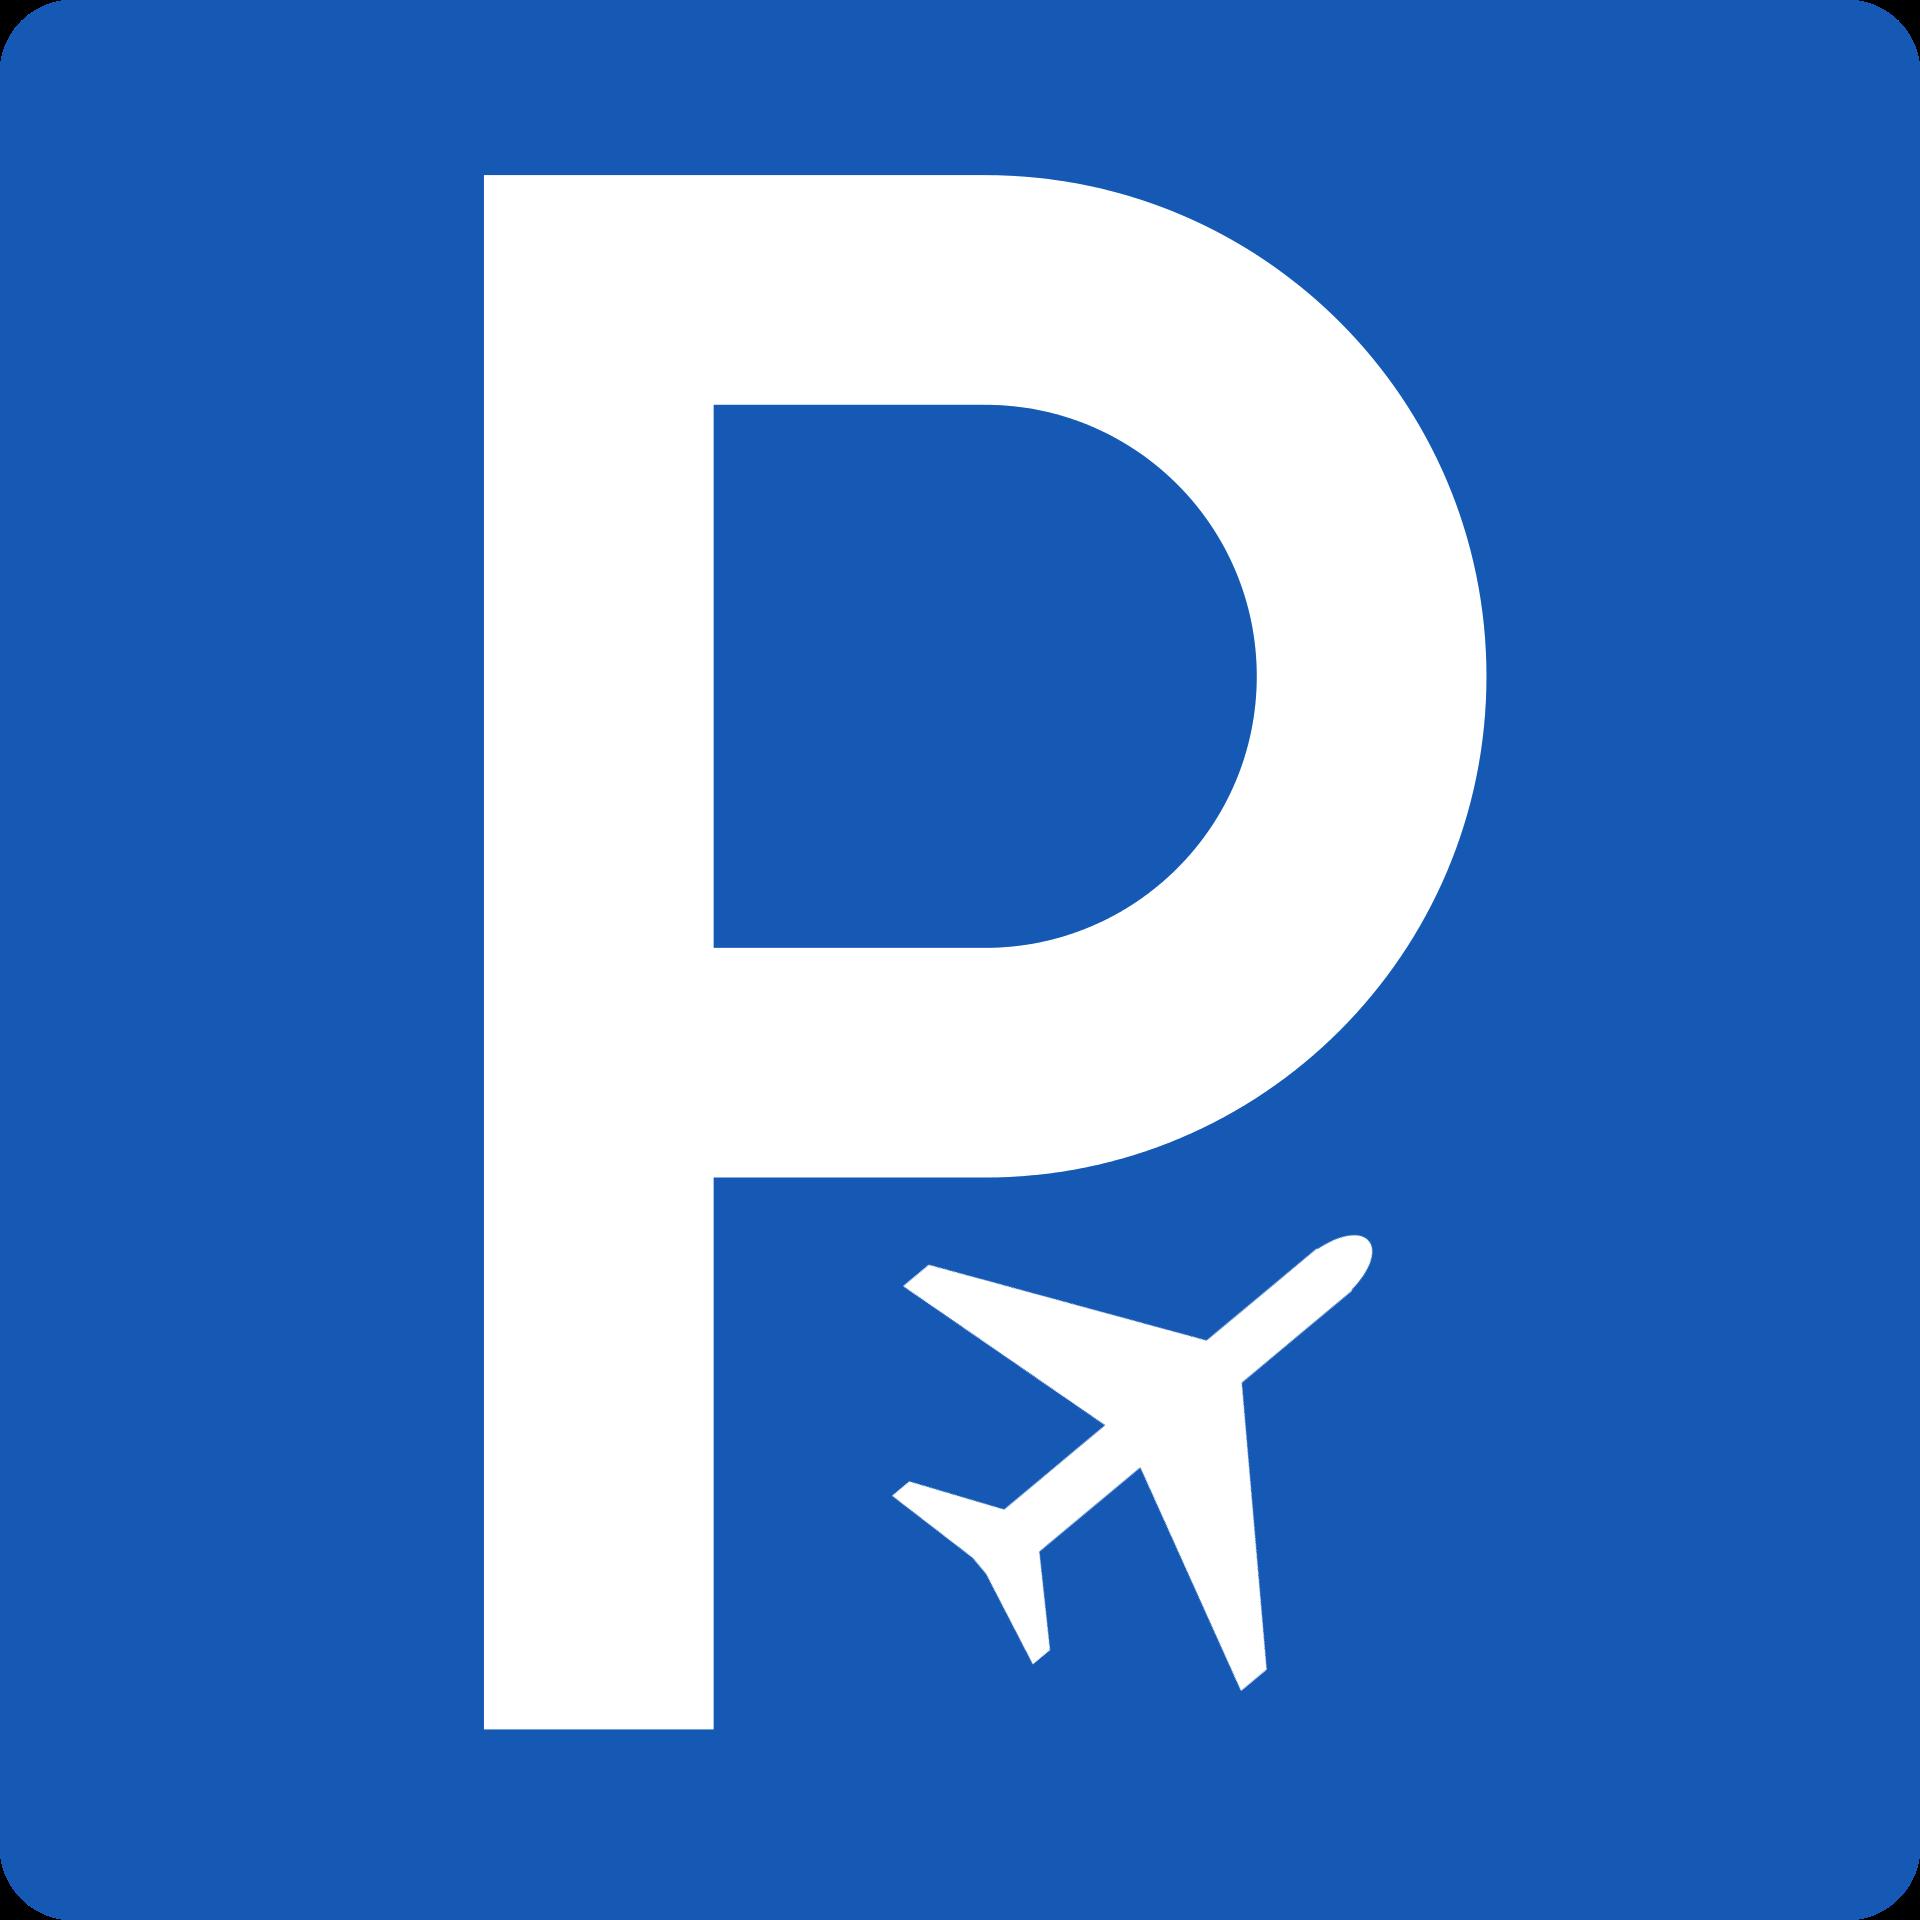 Günstig Parken Flughafen Köln